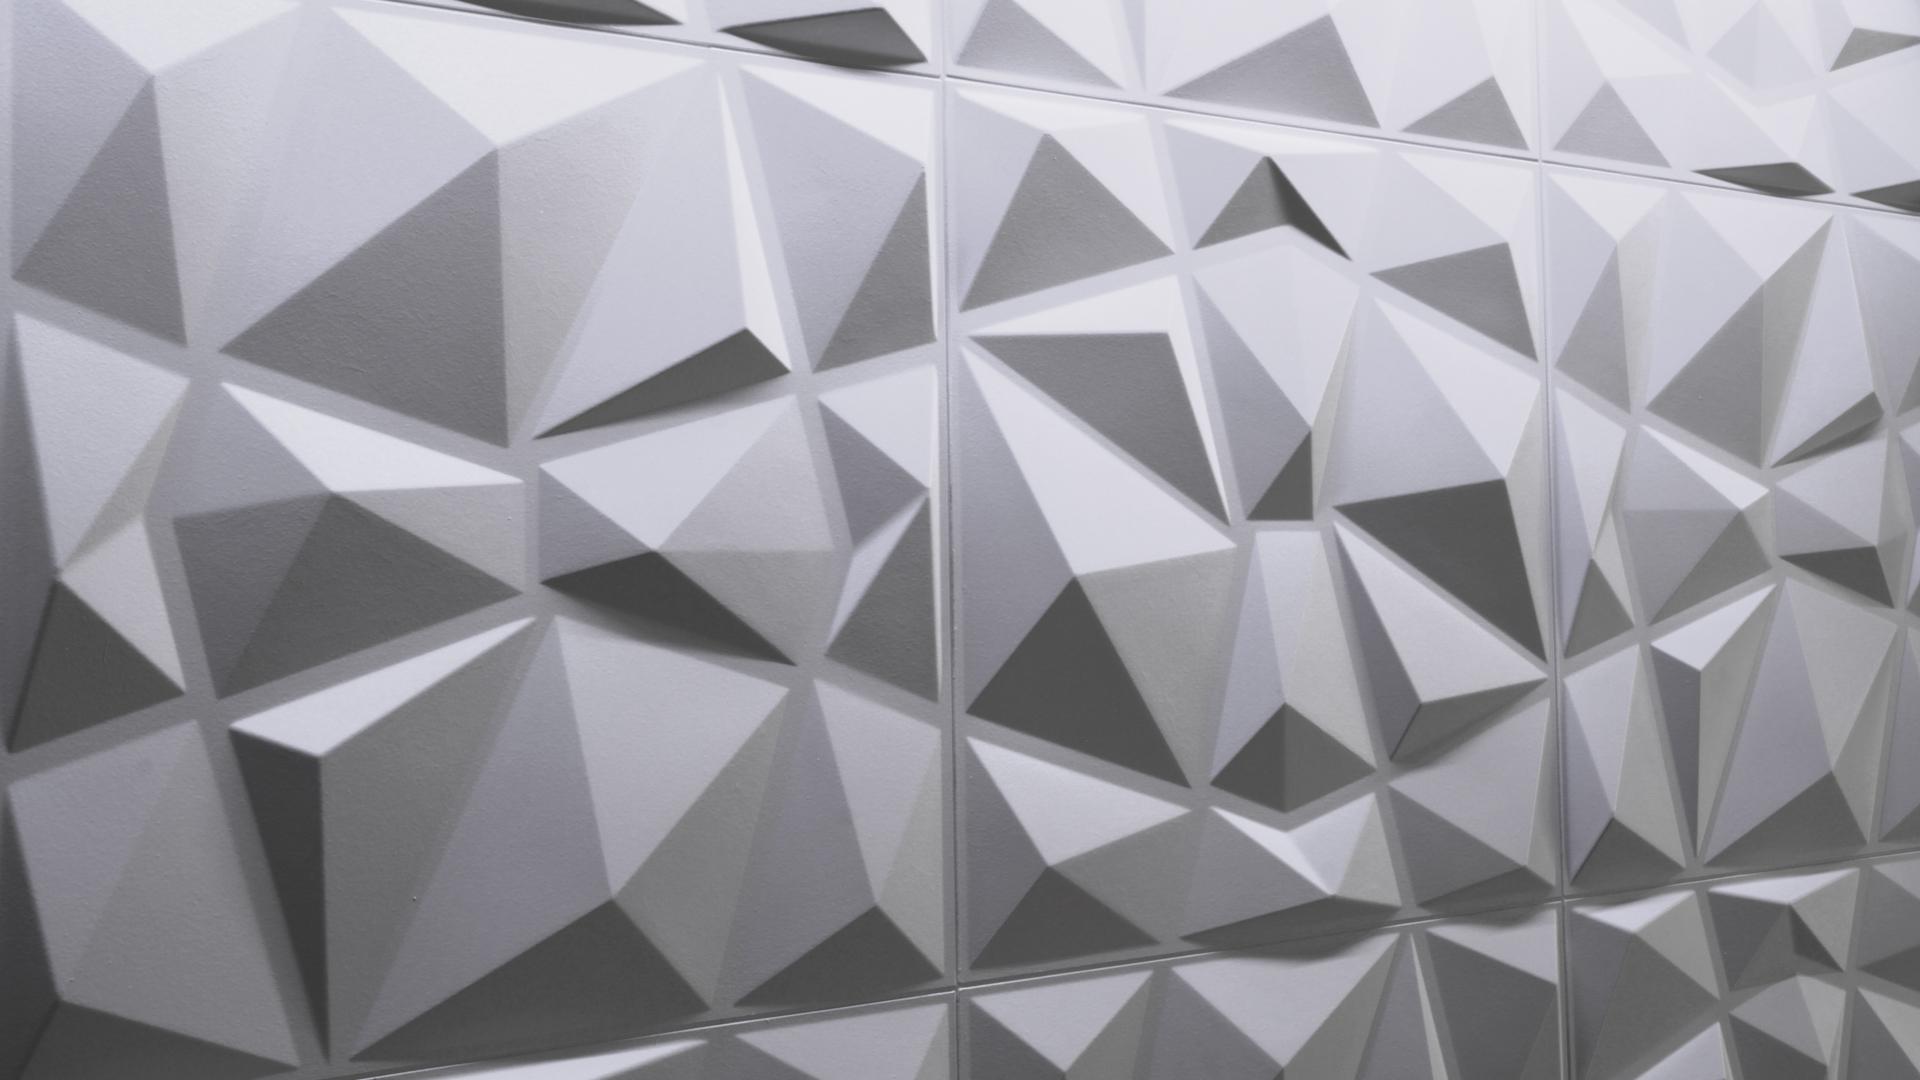 3d Wandpaneele Diamond Wandverkleidung Deckenpaneele 3d